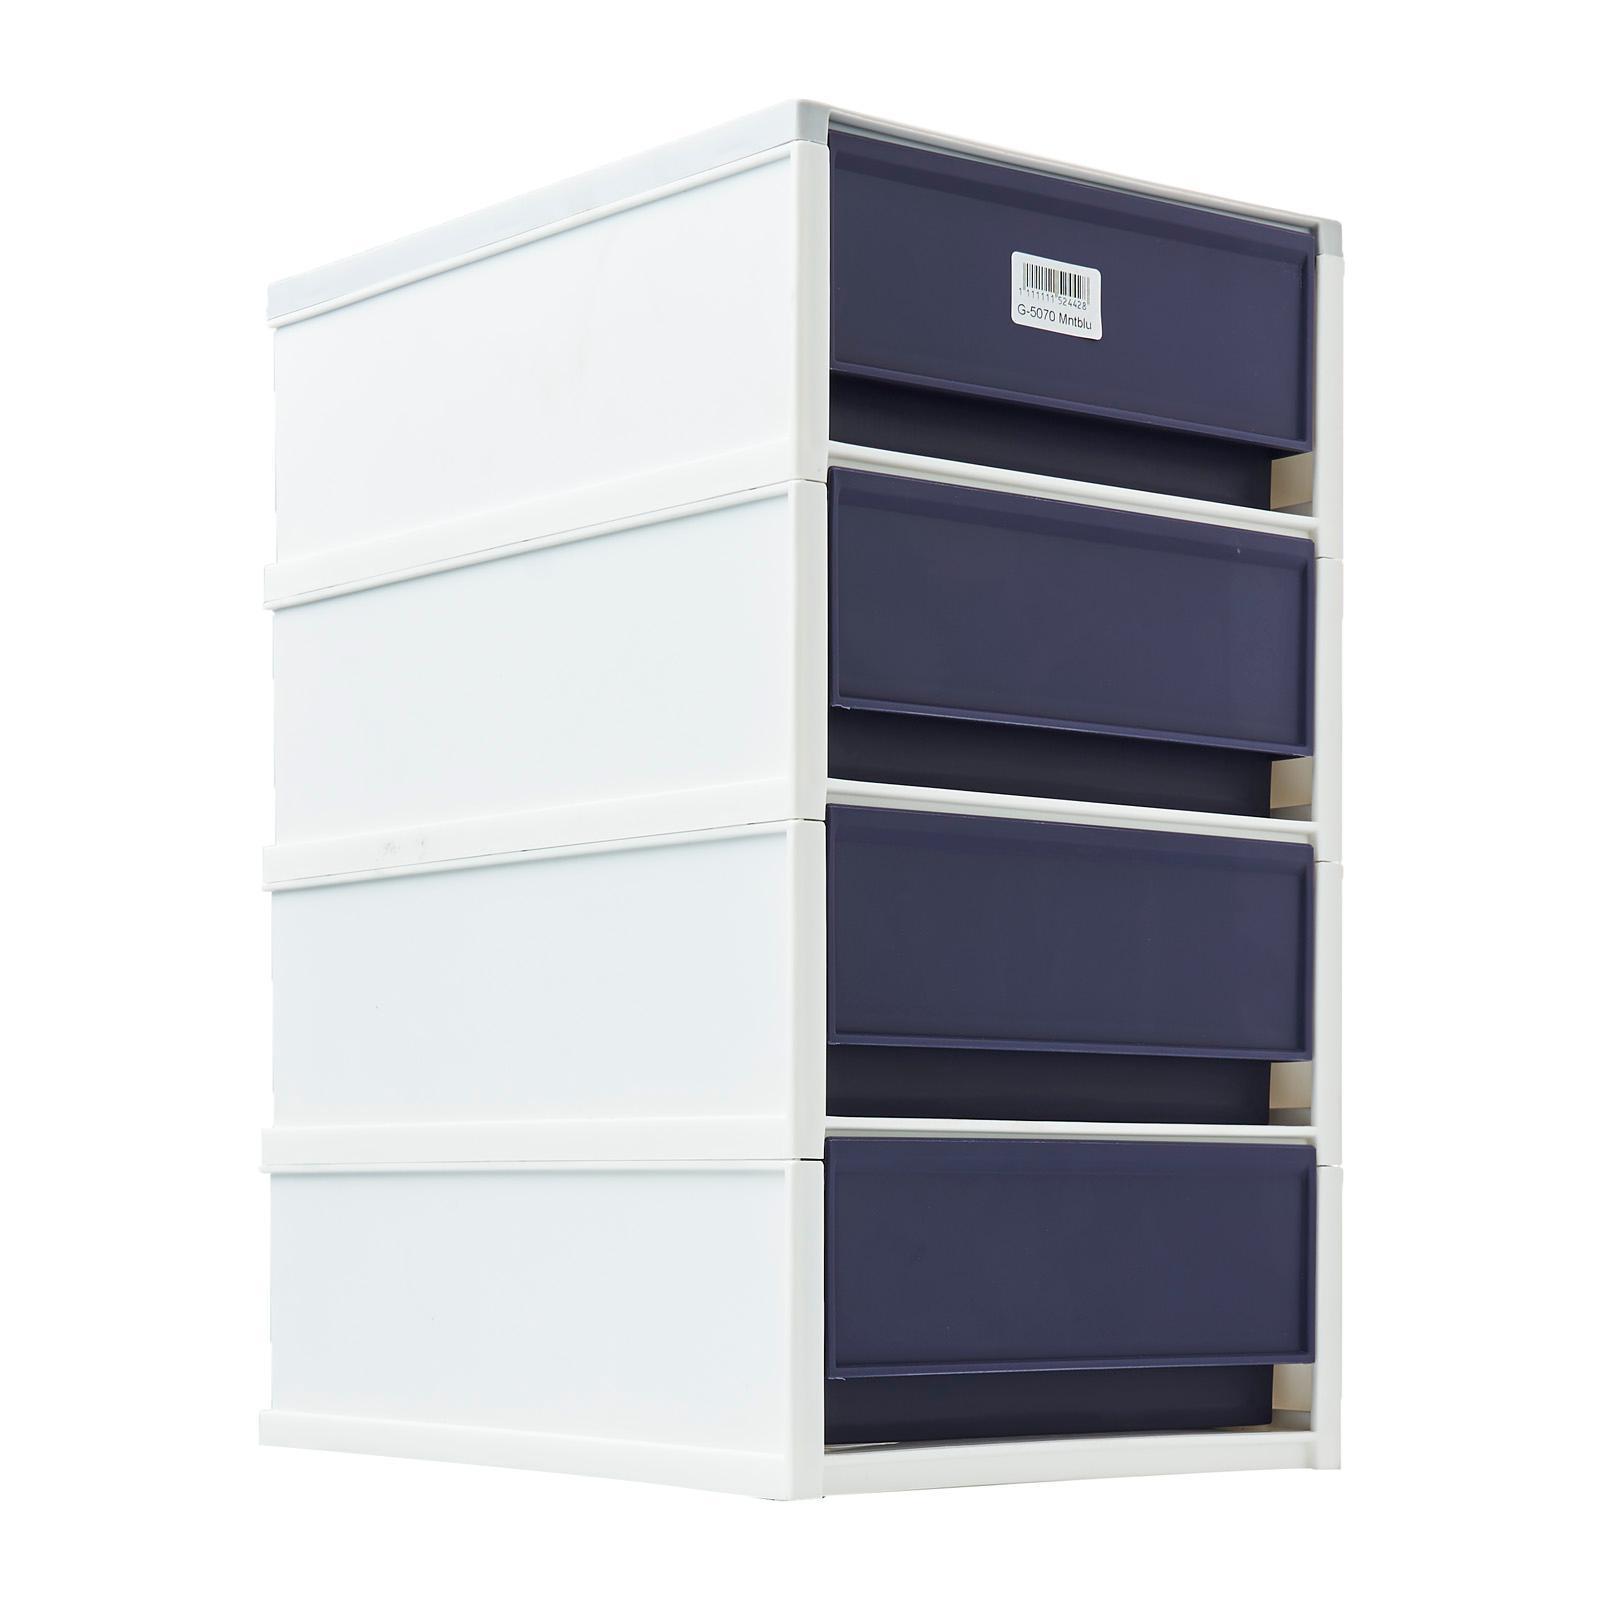 Citylife 10L Frost Mini 4 Tier Cabinet (Medium)